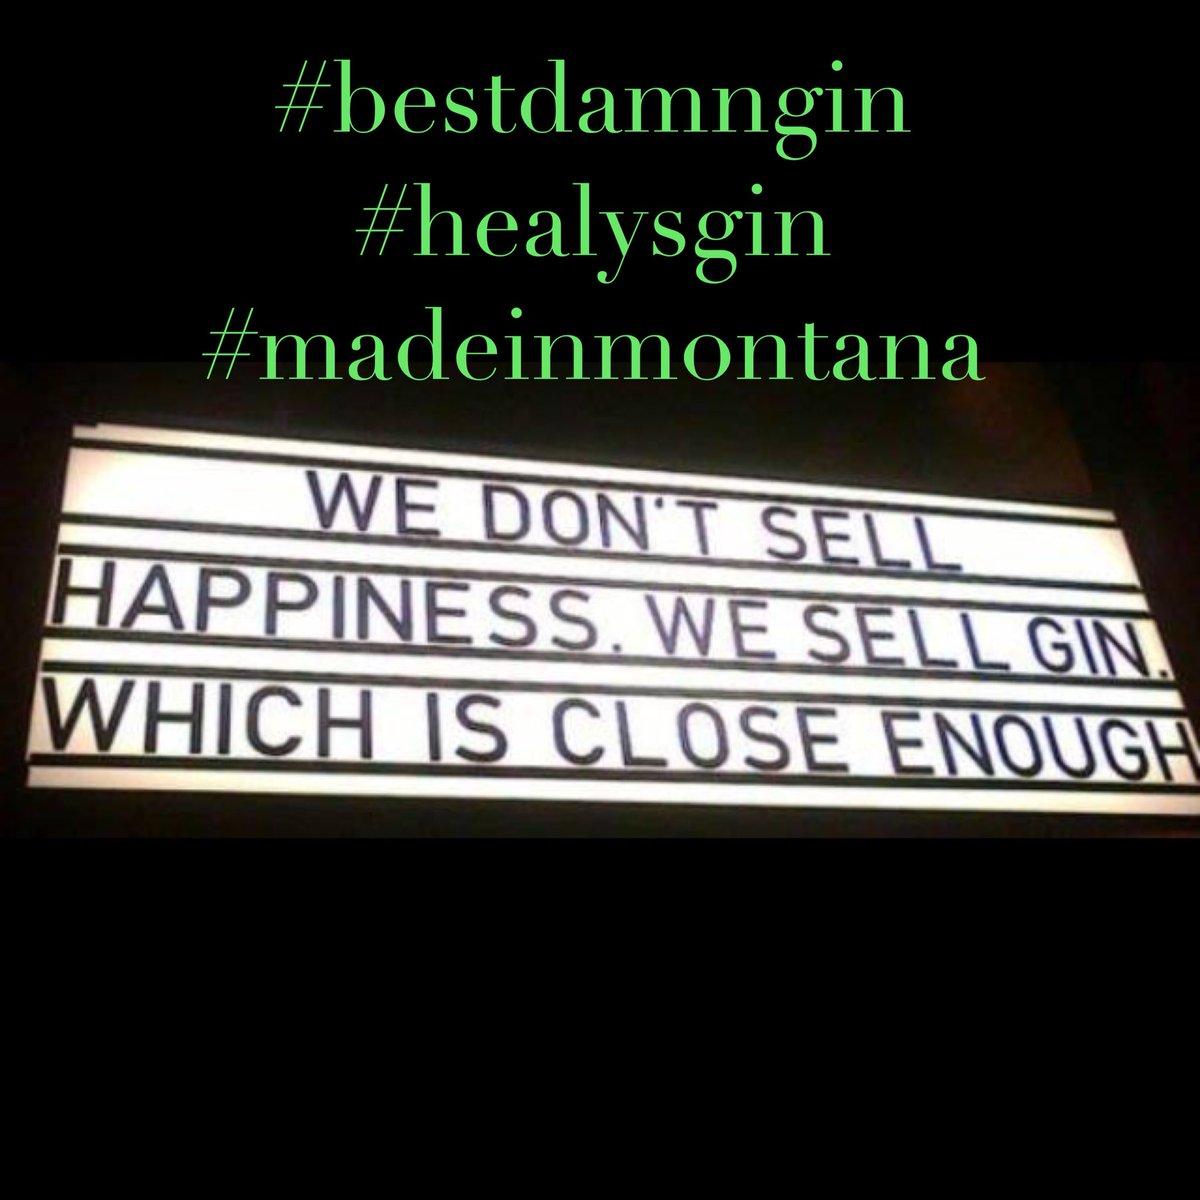 t.g.i.f. #bestdamngin #healysgin #madeinmontanapic.twitter.com/M915C1Fso8